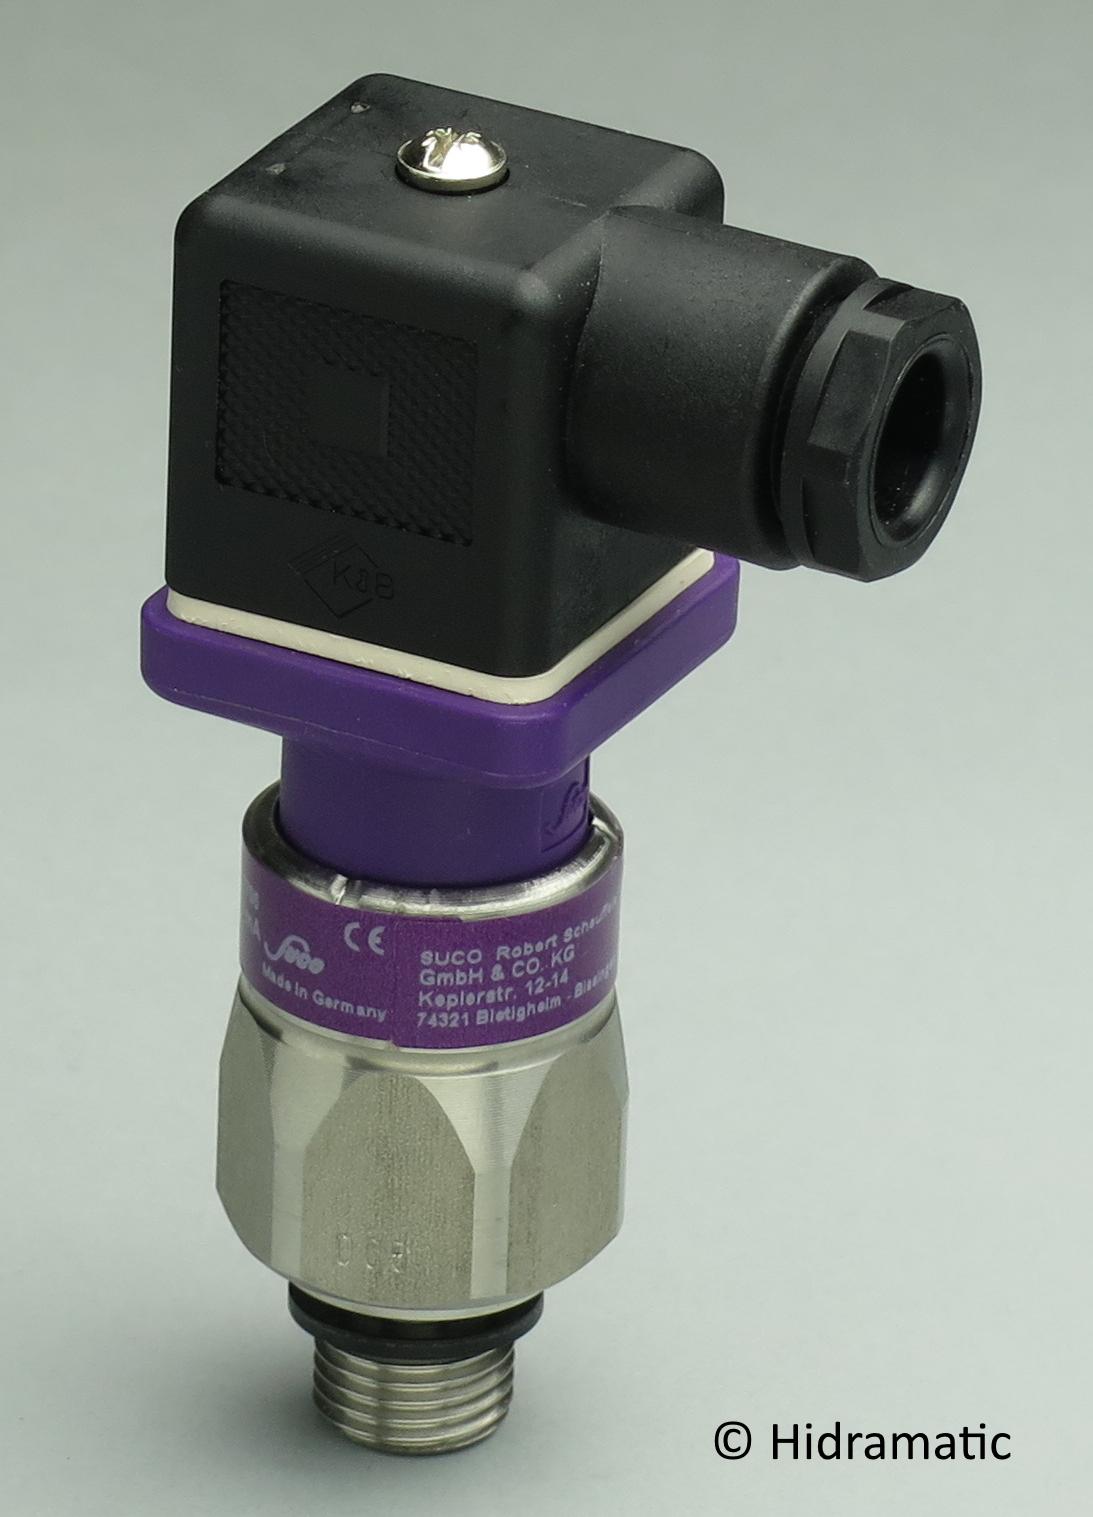 Pressure transmitter SUCO 0602401411013, 4-20 mA, 0-40 bar (0-580 psi), G1/4-E, DIN